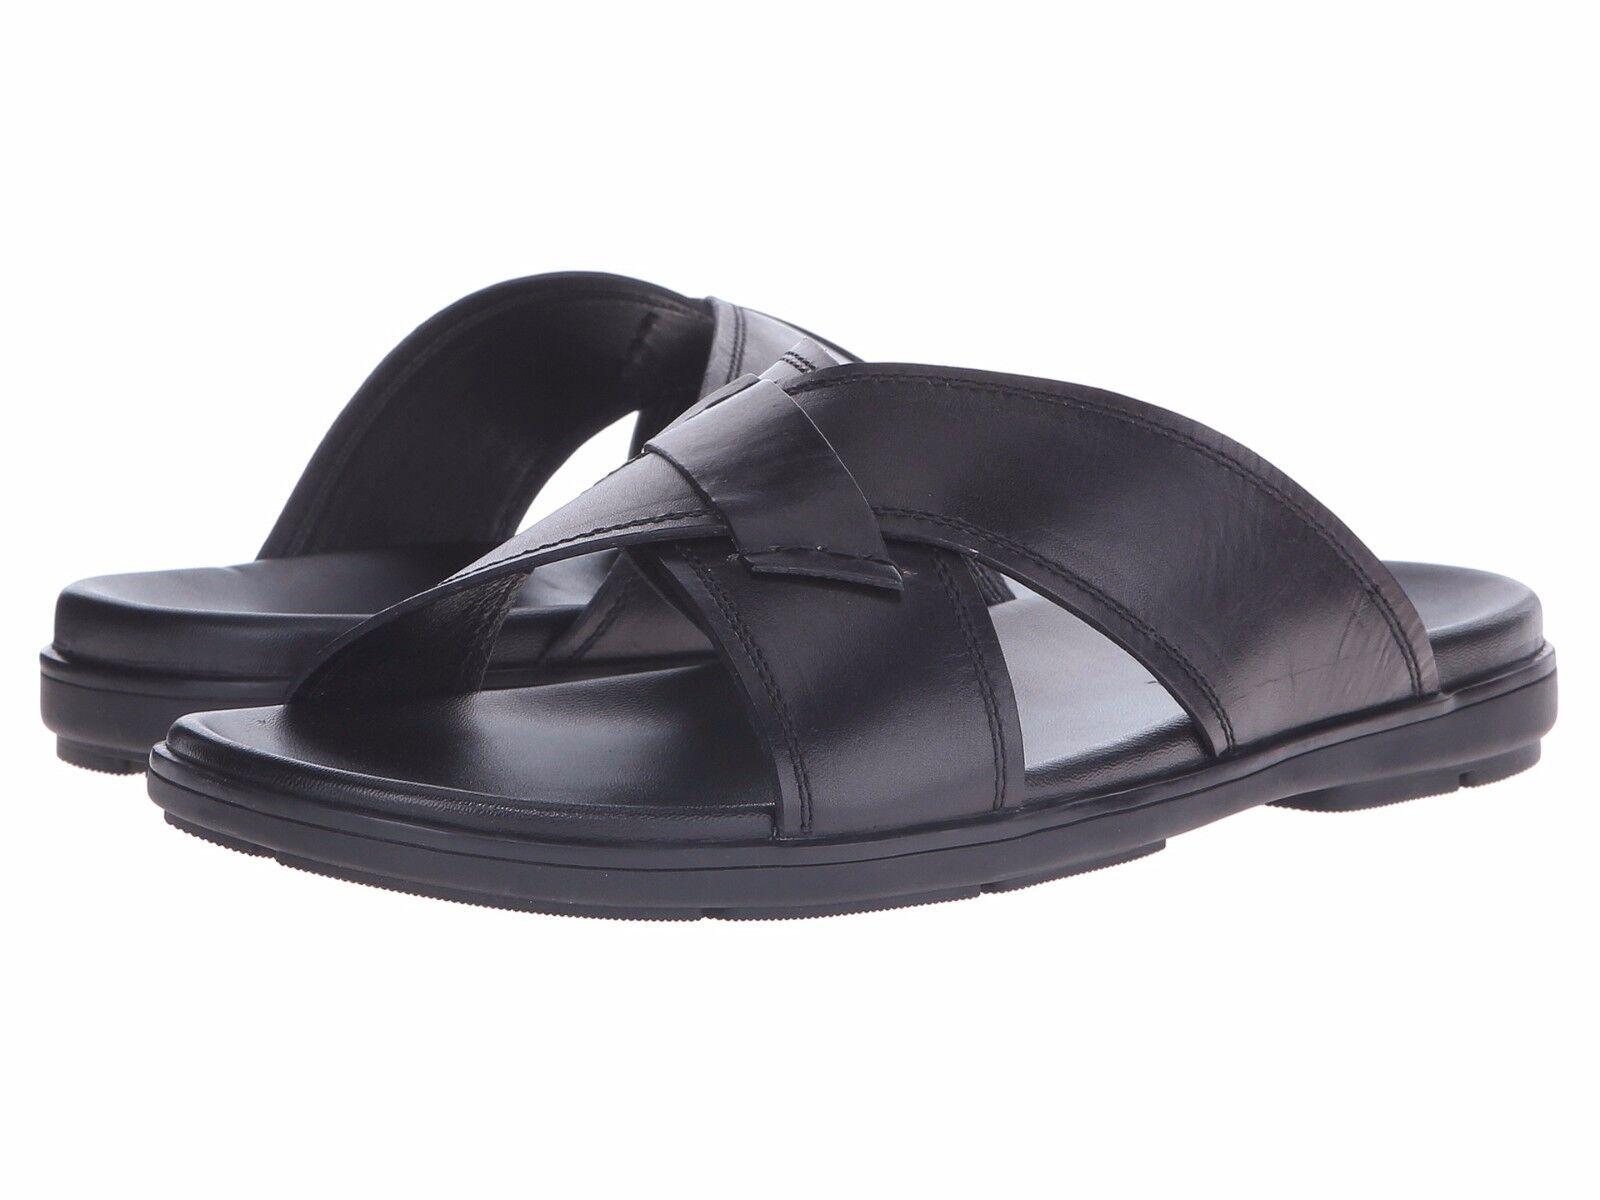 Men's shoes Kenneth Cole Lite N Up Leather Slide Sandals KMS6LE058 Black New